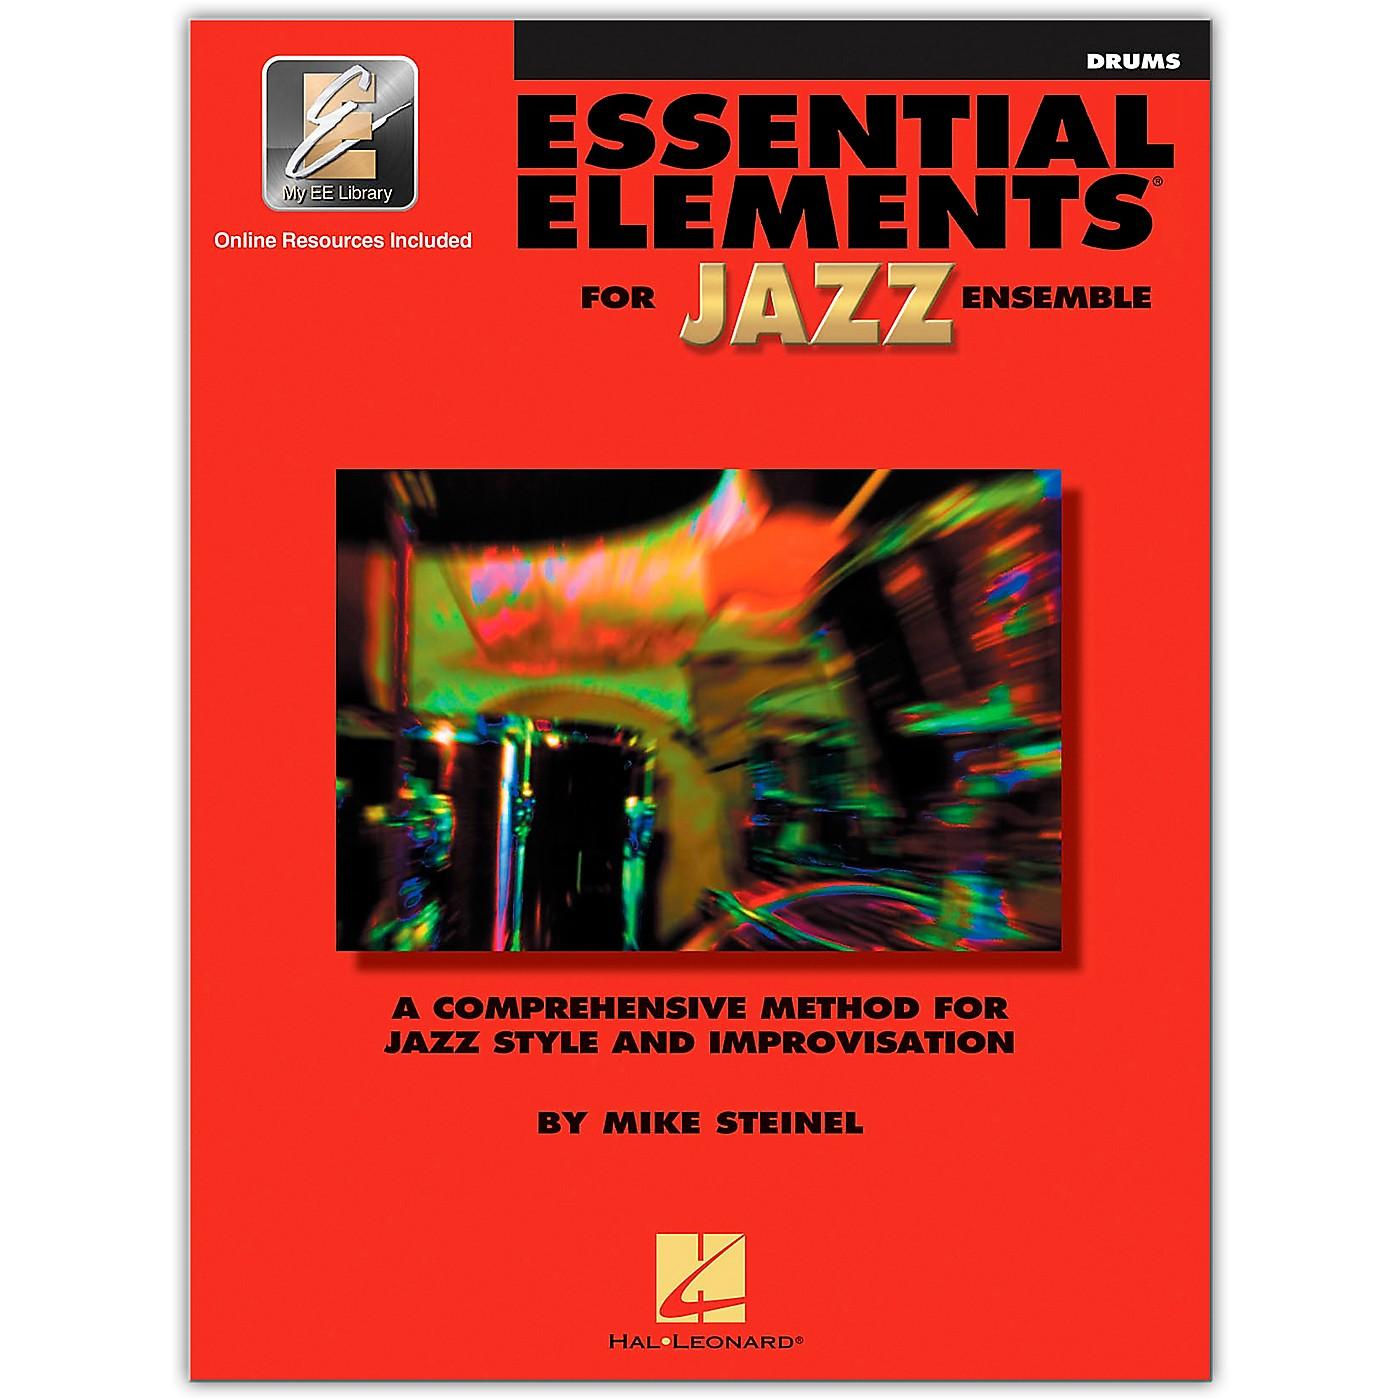 Hal Leonard Essential Elements for Jazz Ensemble - Drums (Book/Online Audio) thumbnail